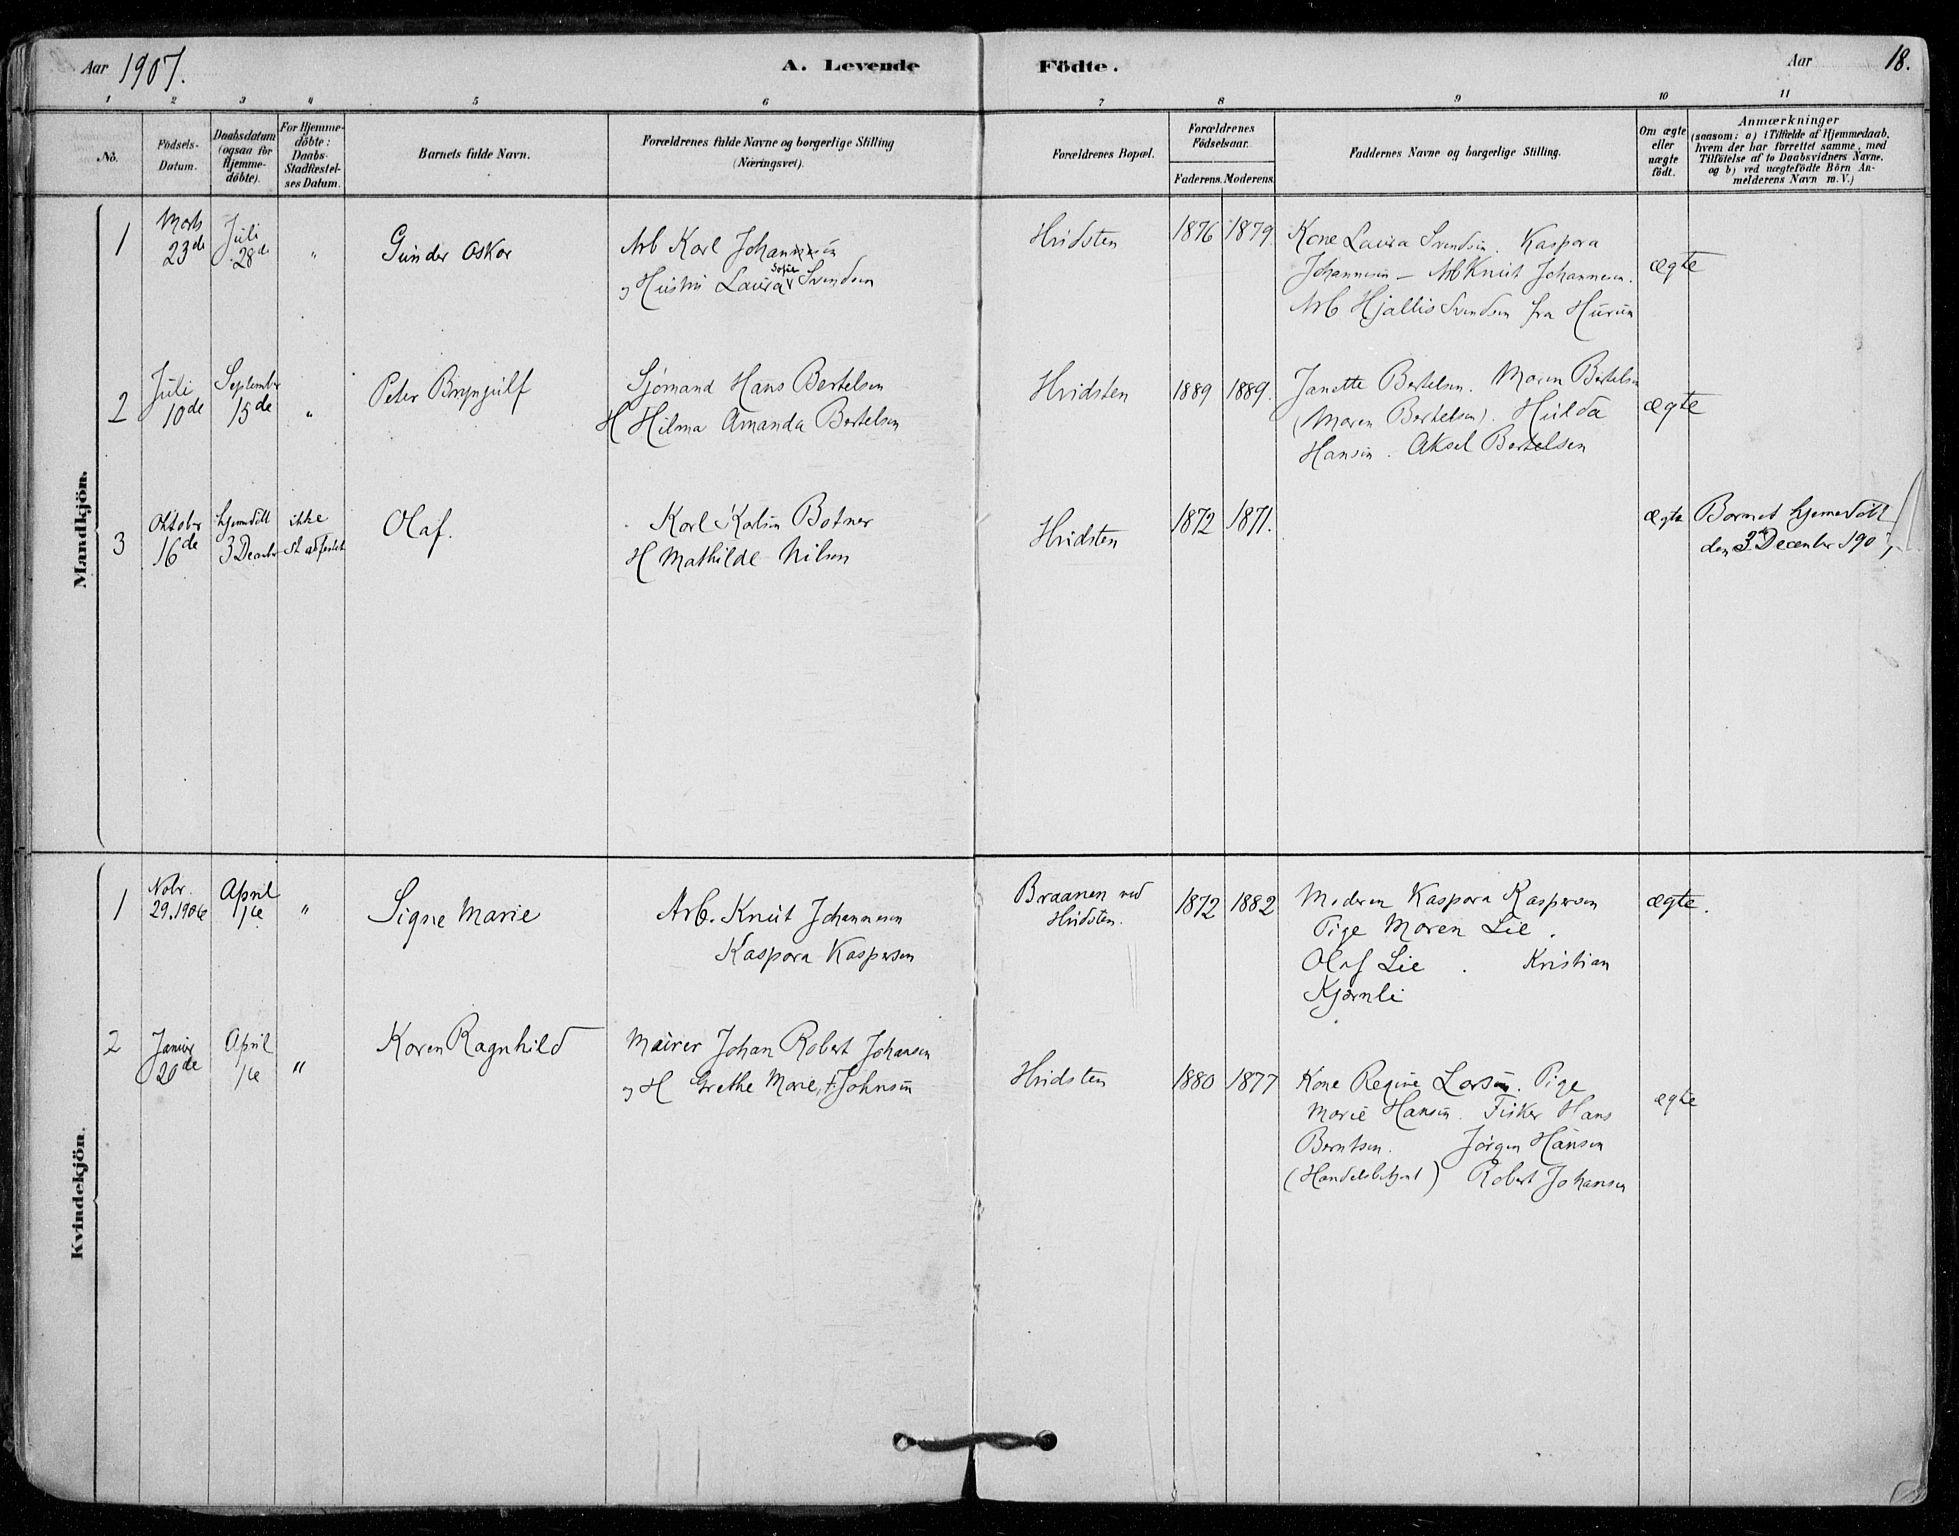 SAO, Vestby prestekontor Kirkebøker, F/Fd/L0001: Ministerialbok nr. IV 1, 1878-1945, s. 18